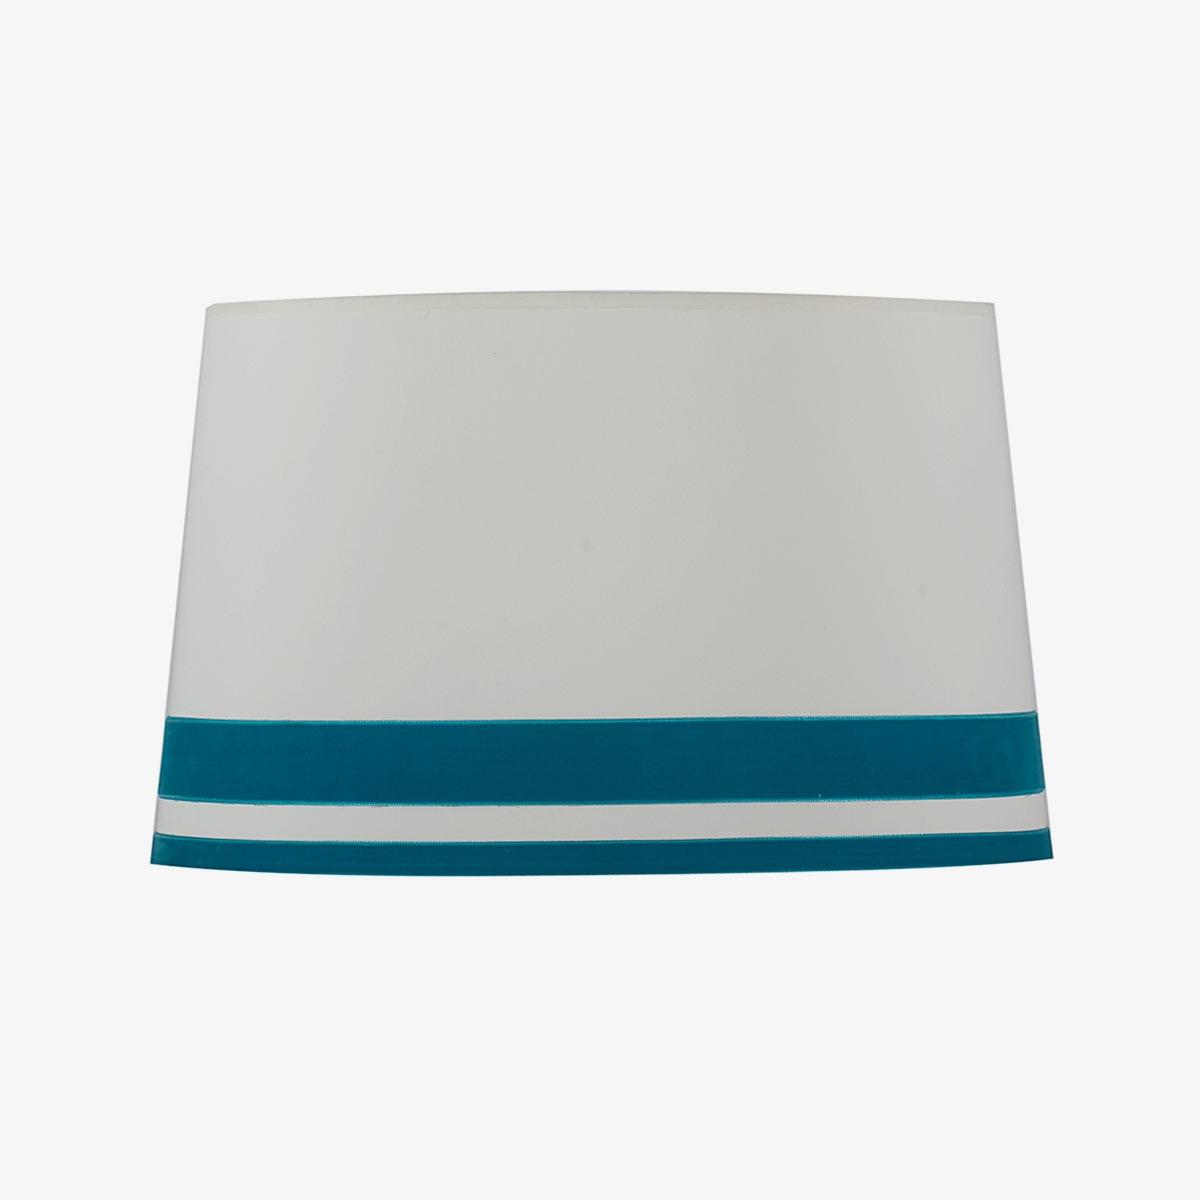 Pantalla Róterdam cinta terciopelo color azul turquesa   Diámetro 40 cm   Loneta blanca